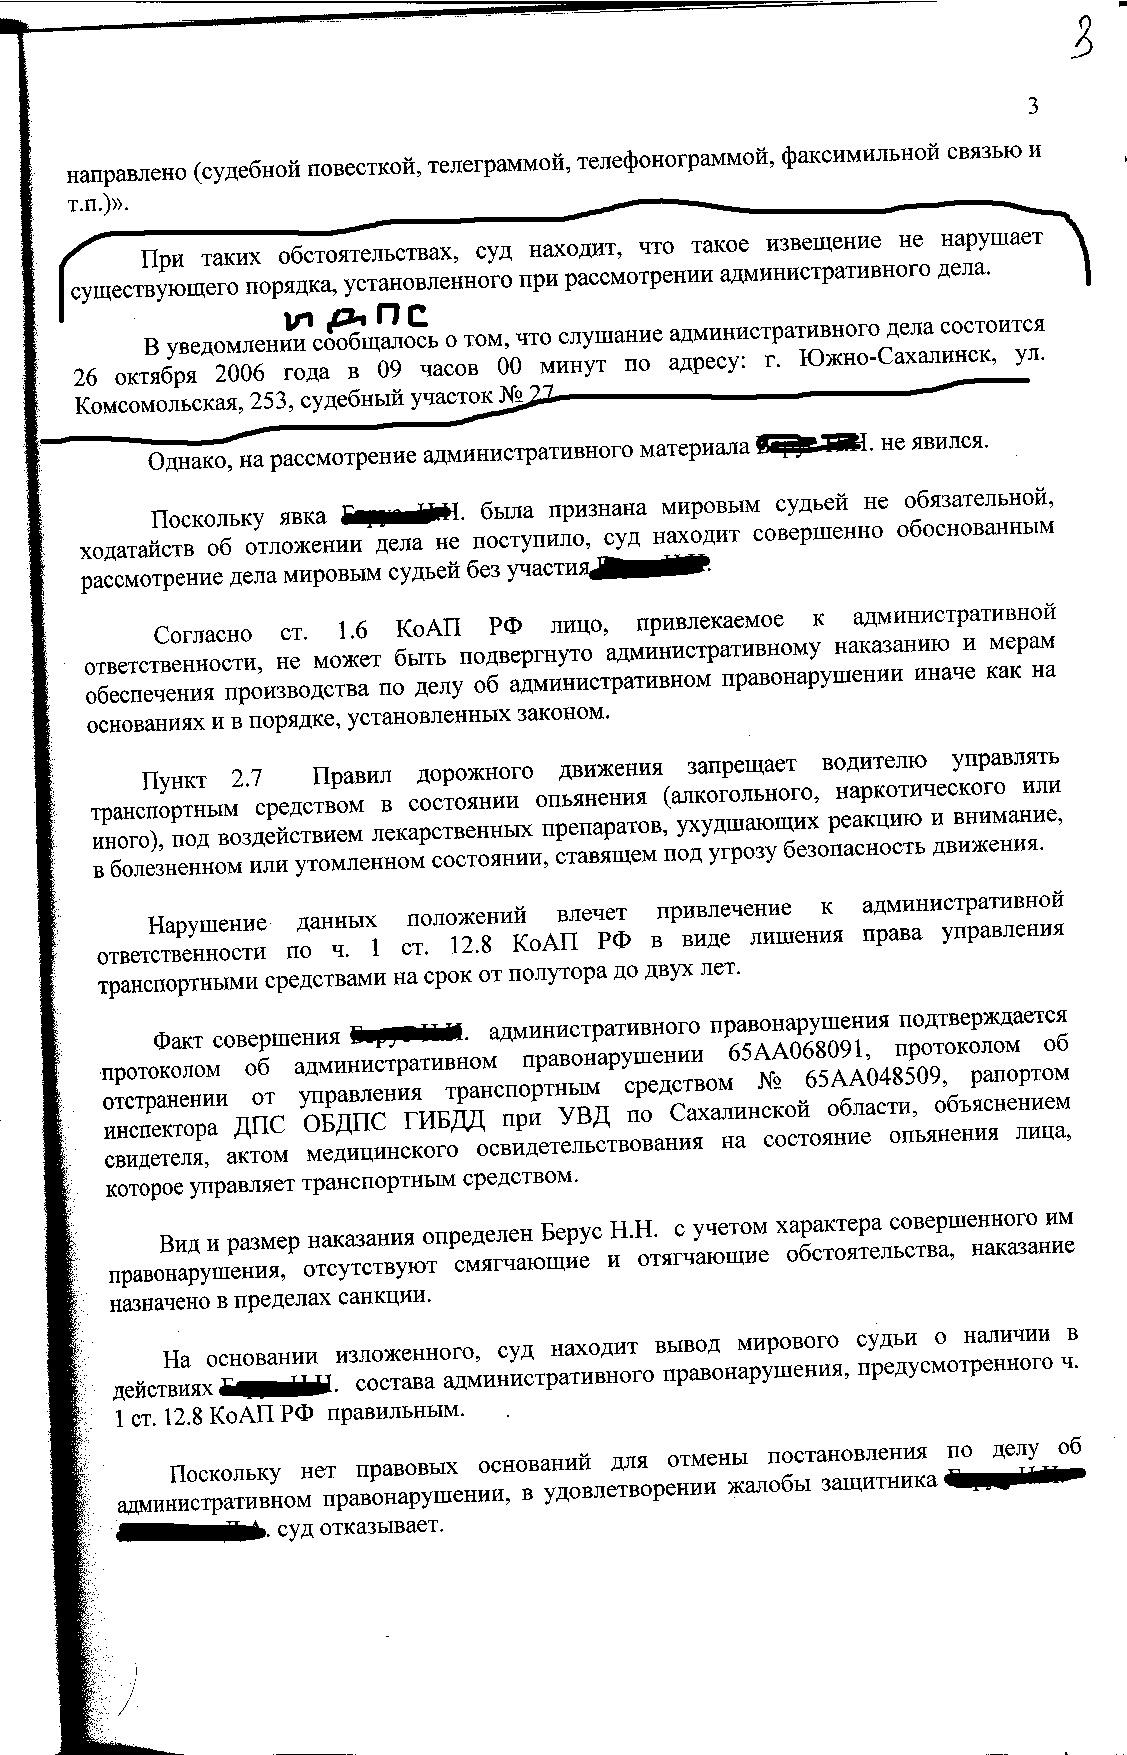 Постановление пленума вс рф 5